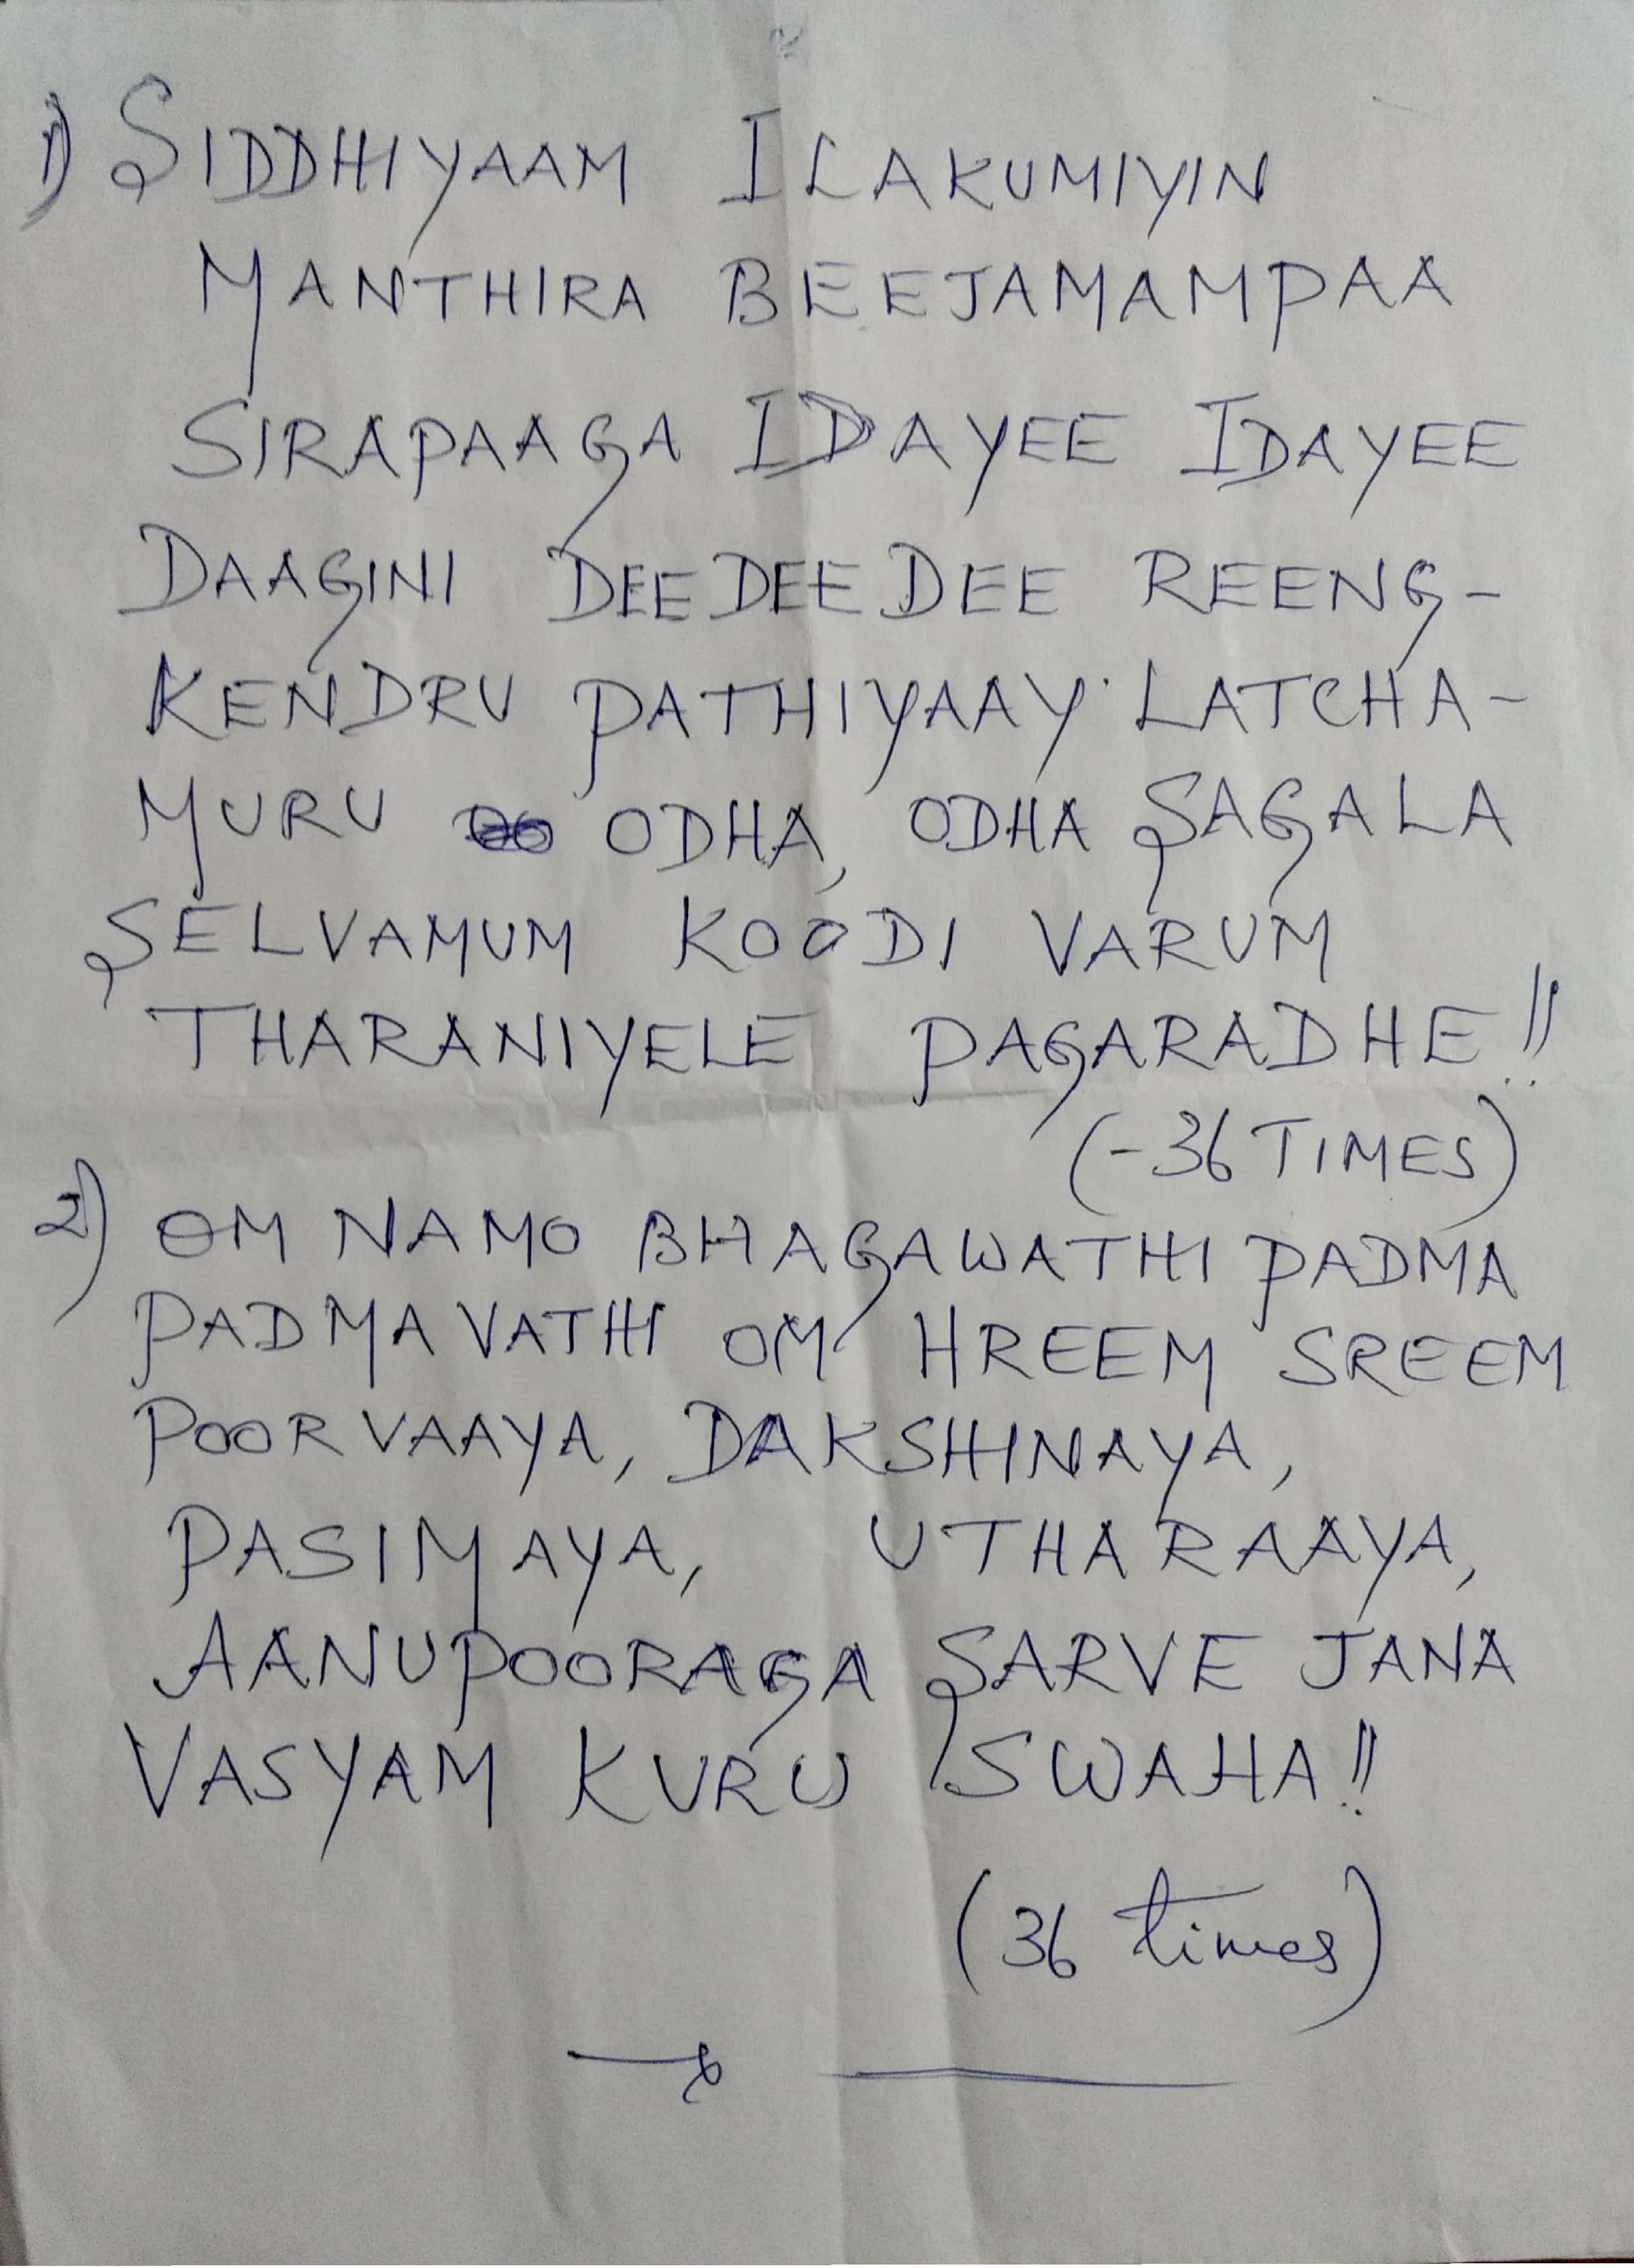 Srimahavarahi